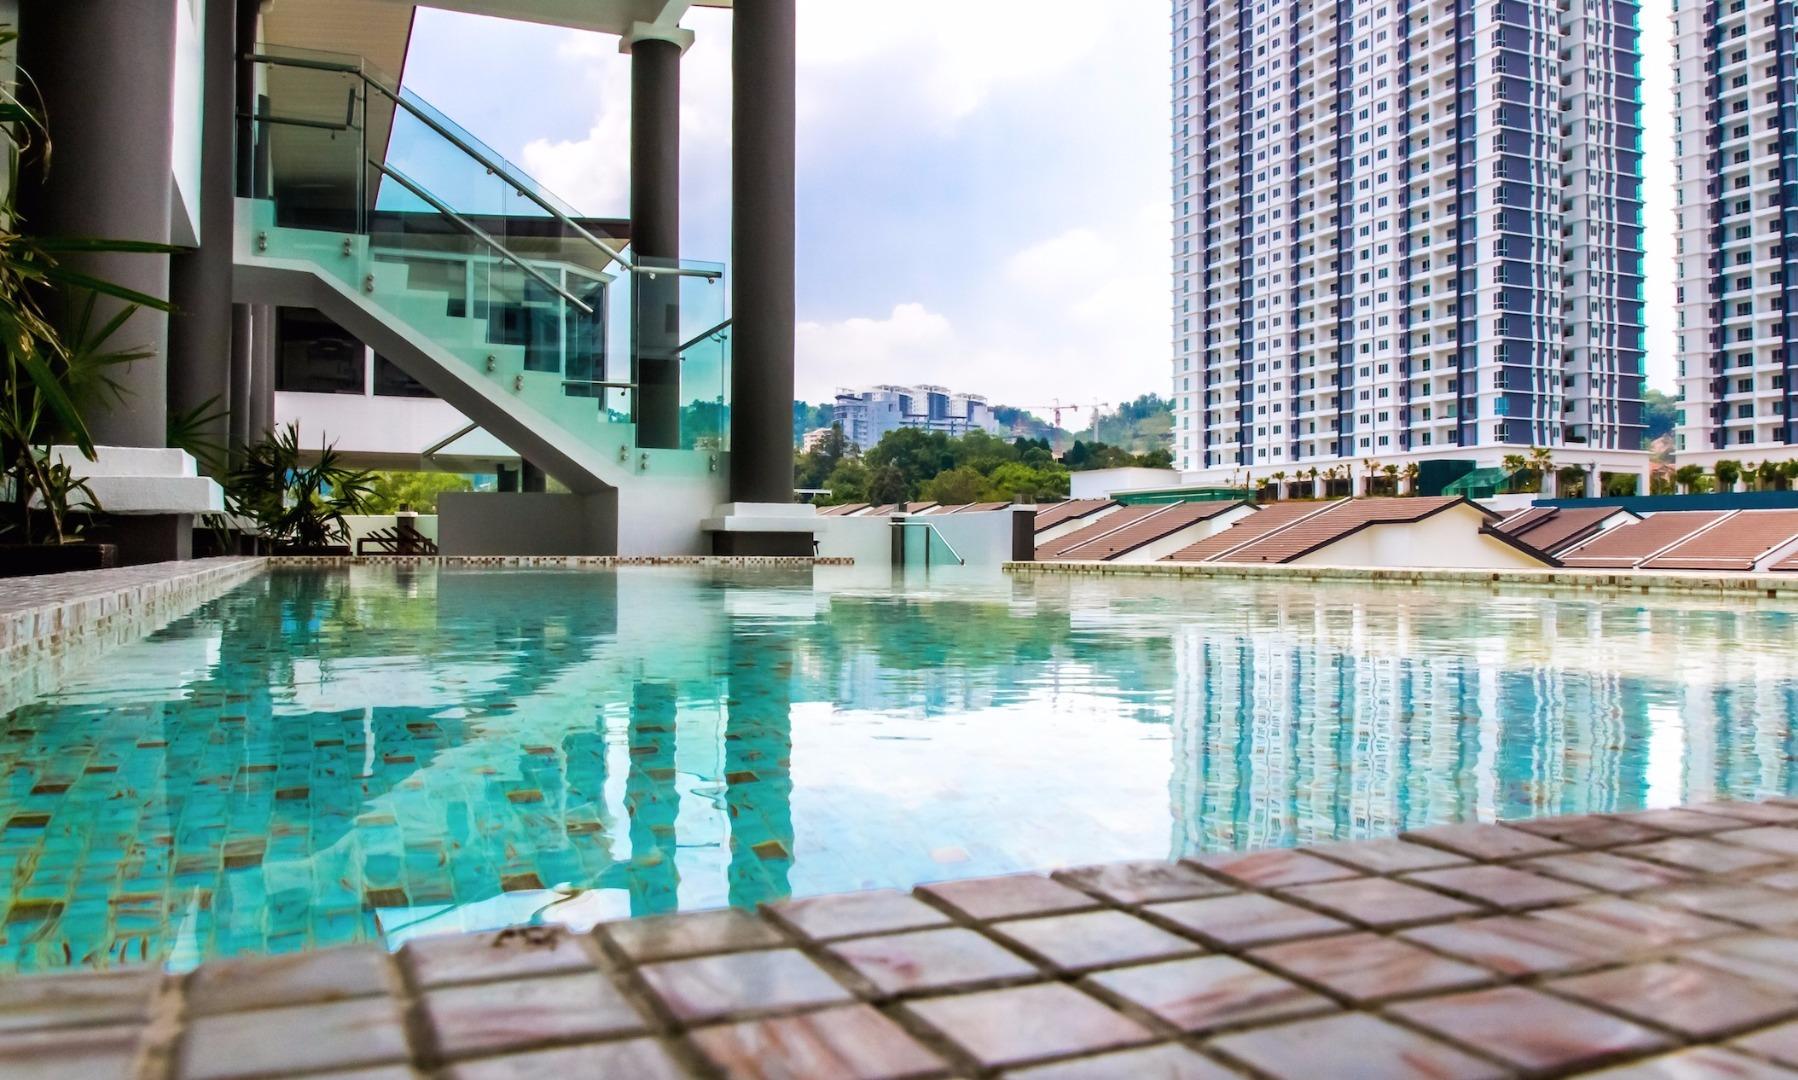 Royalle condominium north kiara segambut property wisdom realty propsocial1